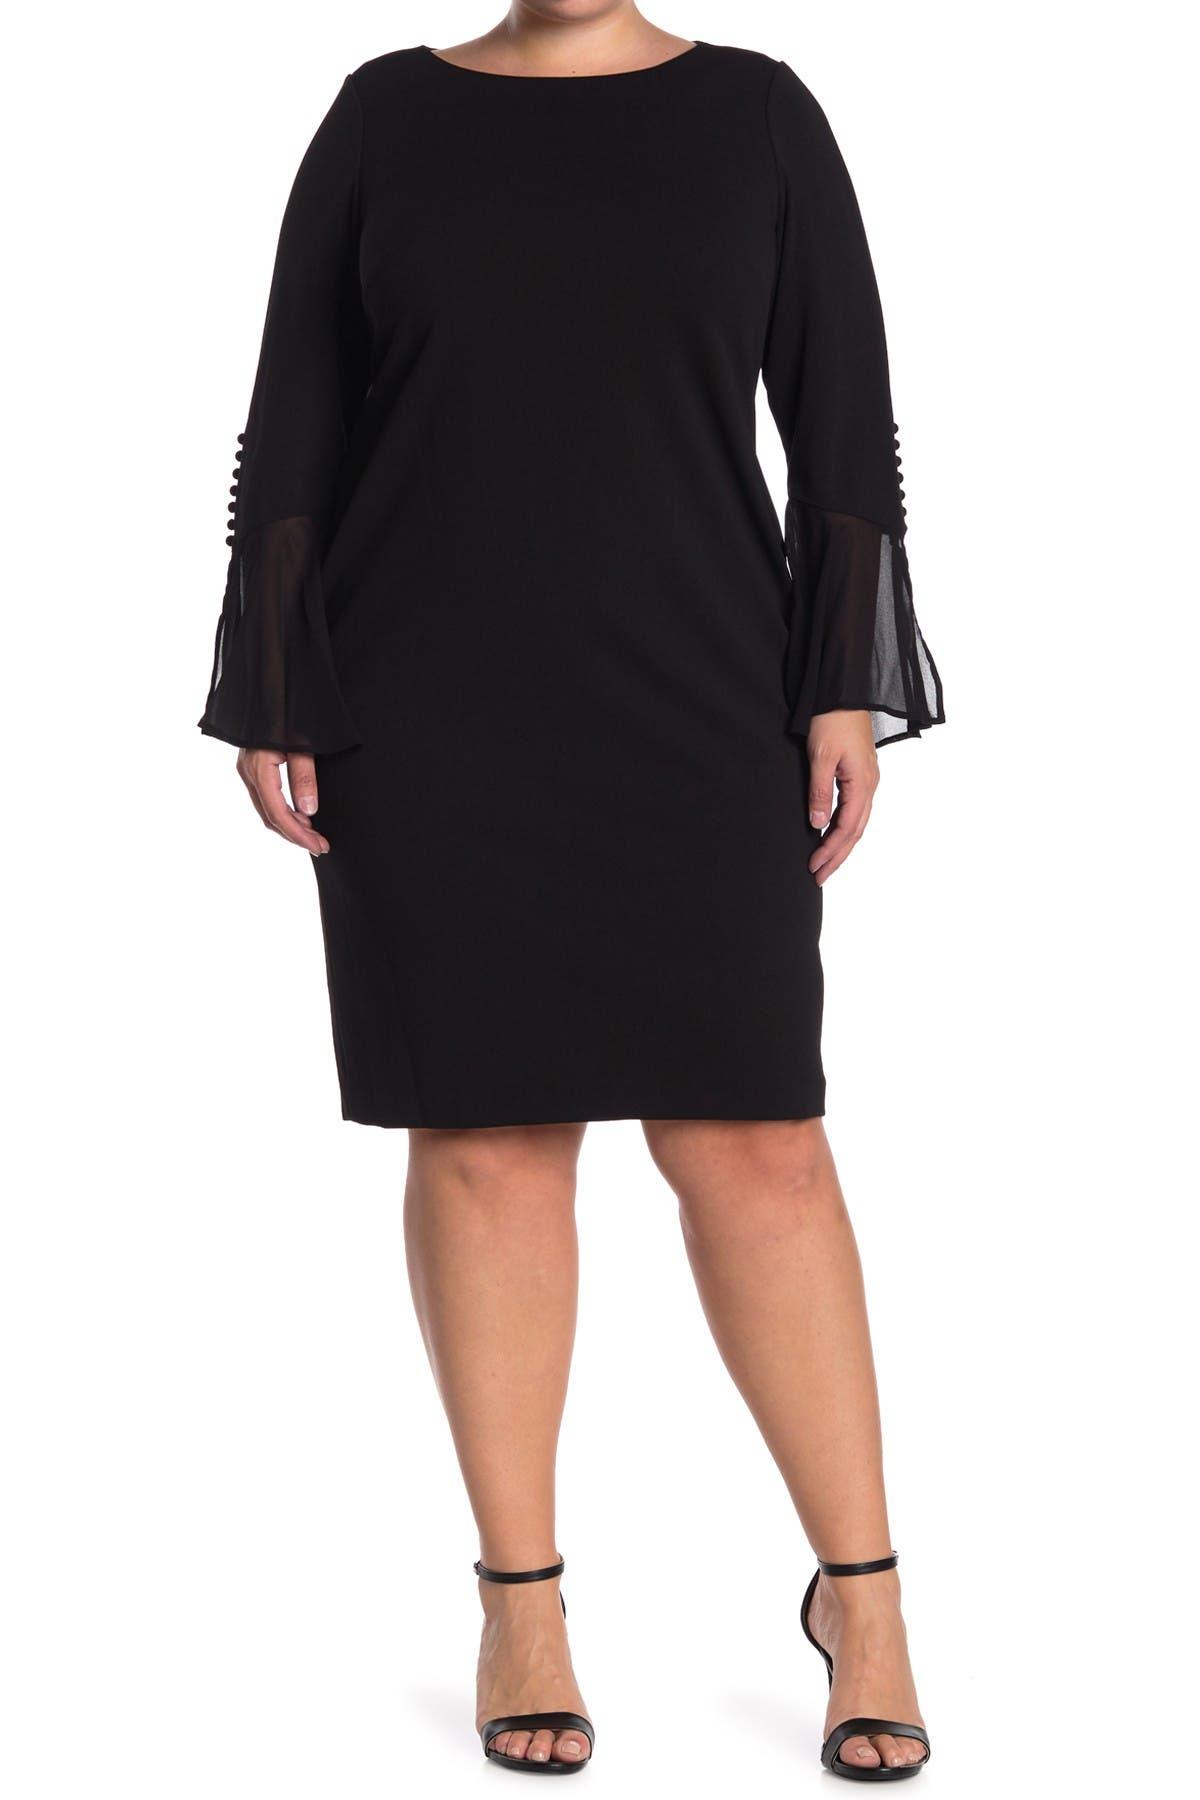 Image of Calvin Klein Button Chiffon Bell Sleeve Sheath Dress